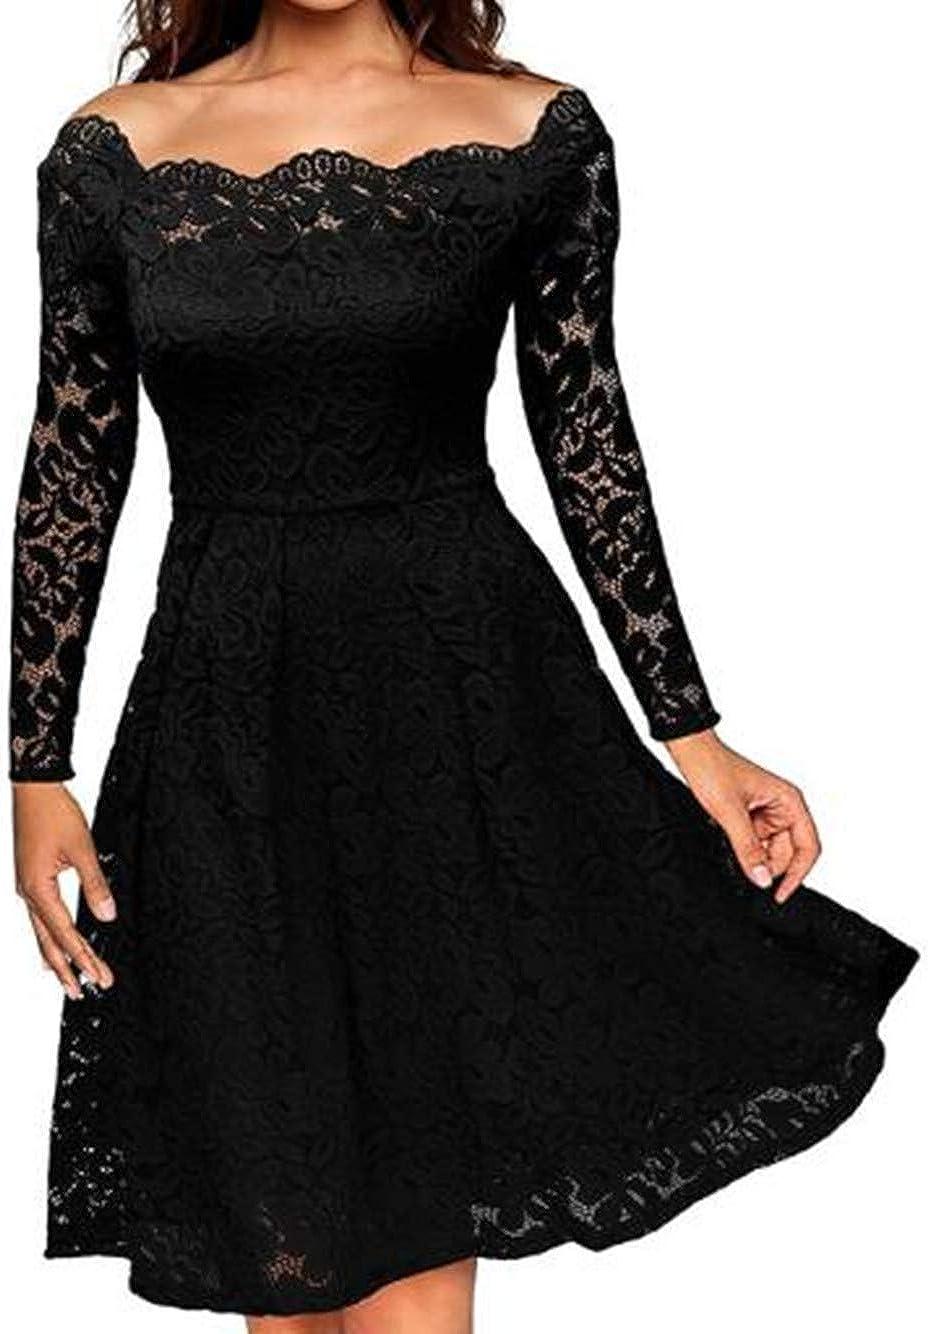 Women's Lace A Line High Waist Swing Dress Printing Cocktail Prom Princess Dress